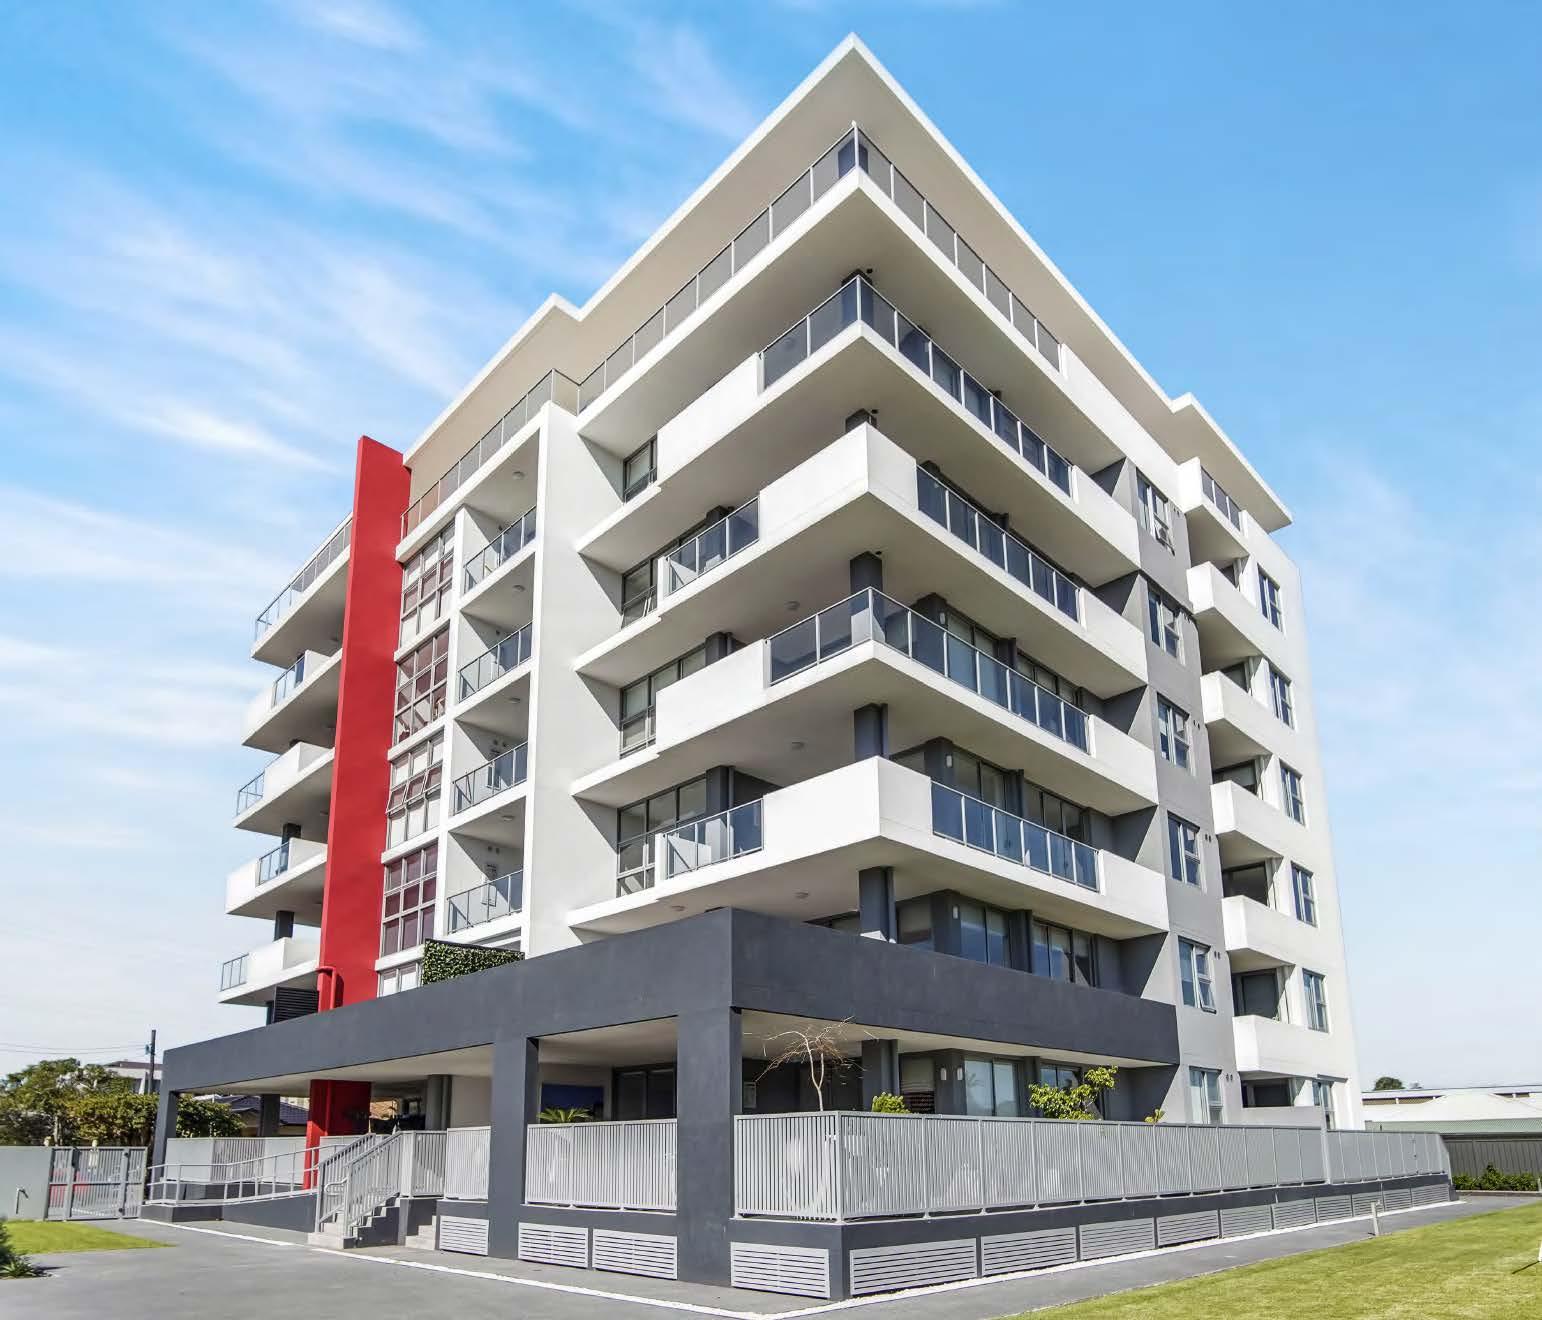 https://www.blaqprojects.com.au/wp-content/uploads/2020/08/130-Kembla-Street-Wollongong.jpg